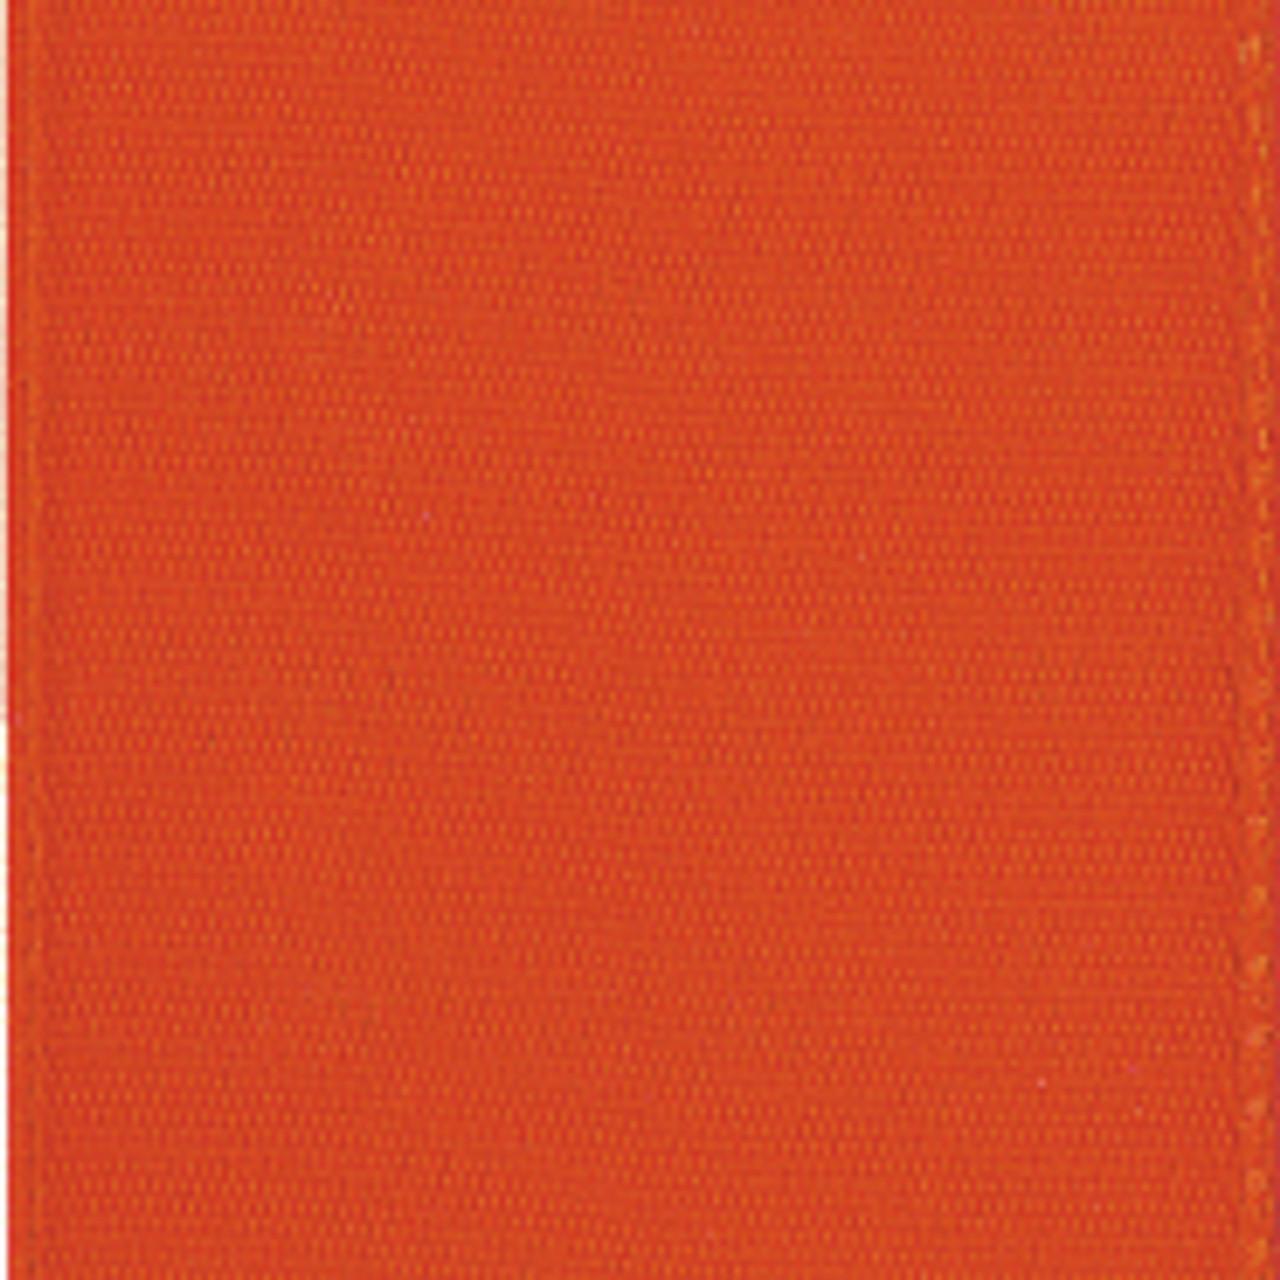 Autumn Orange Single Faced Satin Ribbon